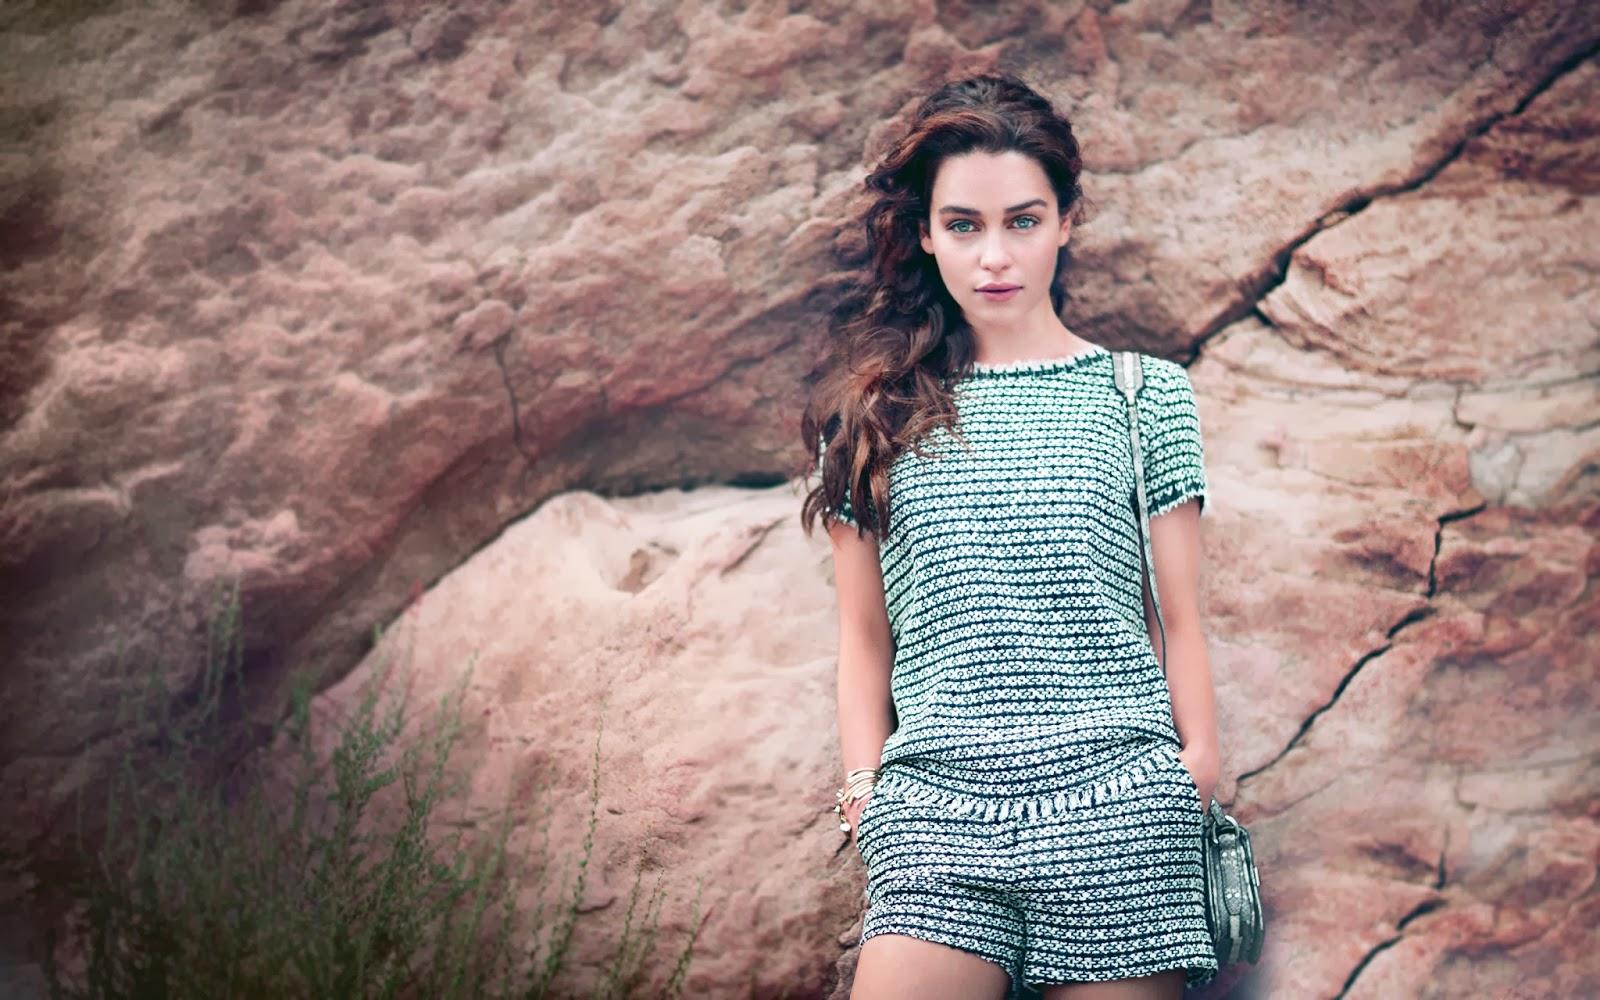 "<img src=""http://1.bp.blogspot.com/-1Ry3sZghU5U/UuJOxauU2TI/AAAAAAAAKB4/FtOmMOo6ZZE/s1600/emilia-clarke-wallpaepr.jpg"" alt=""emilia clakre wallpaper"" />"